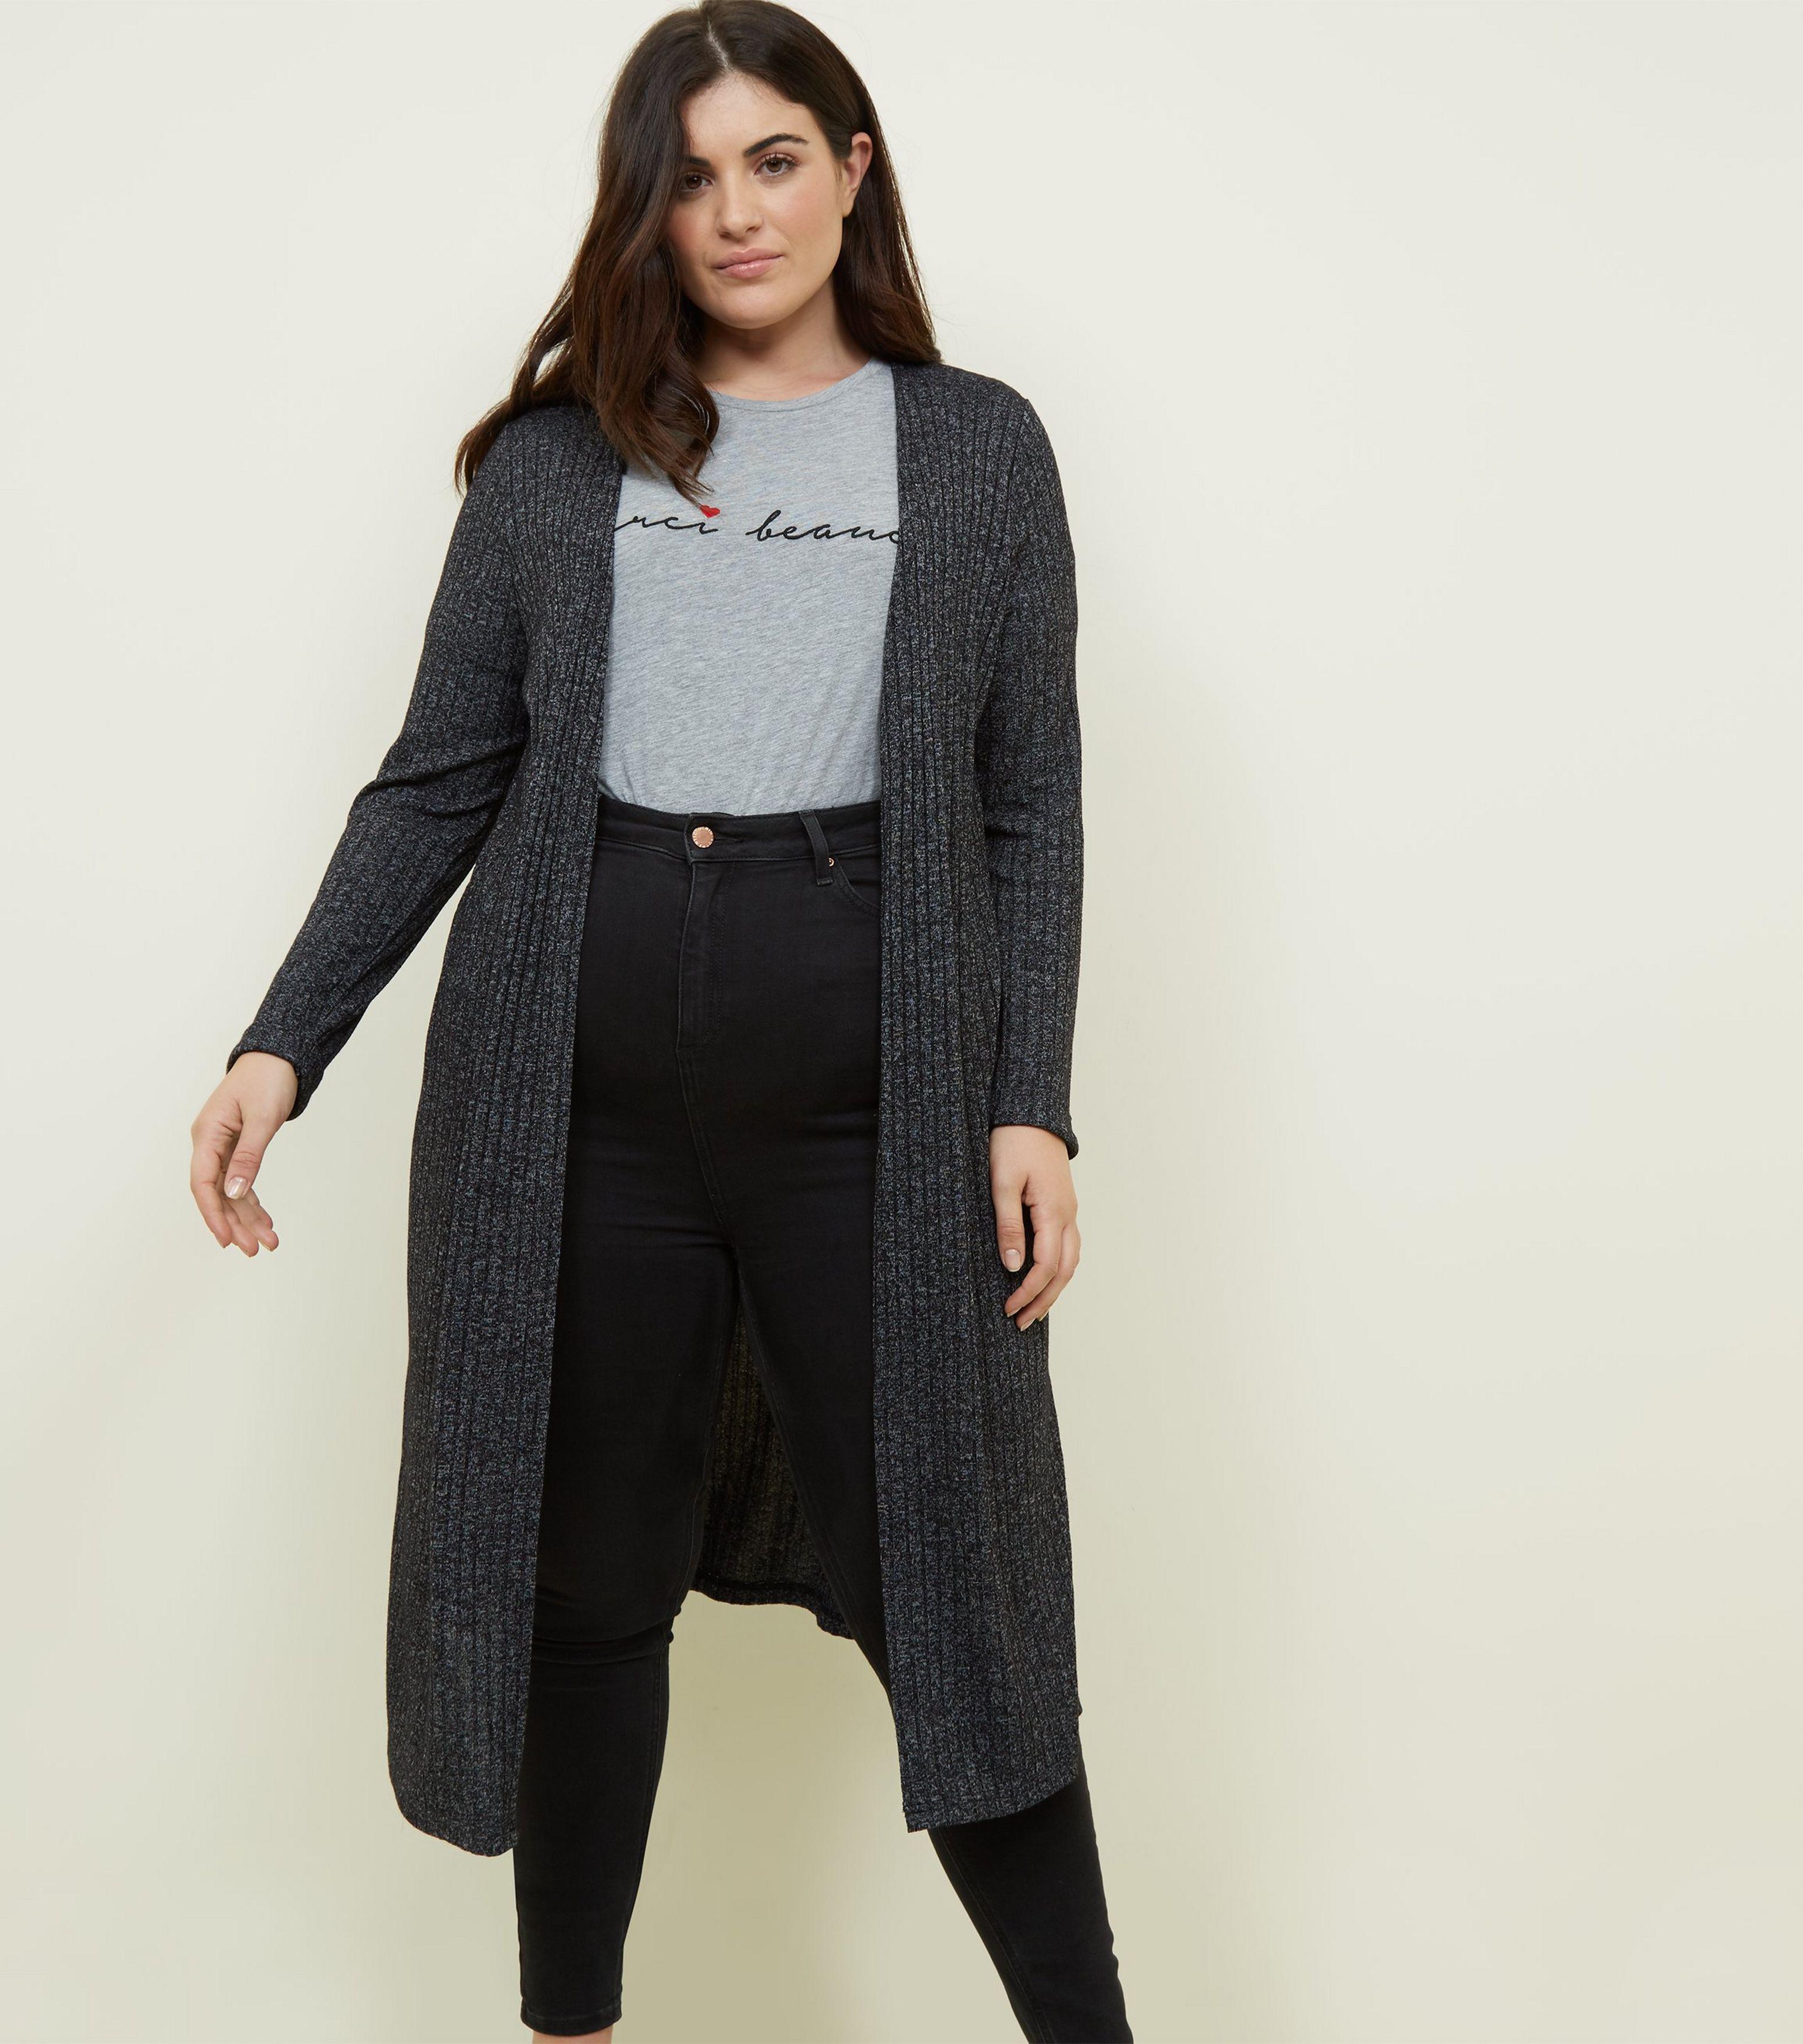 828ab1471294 New Look Curves Black Midi Cardigan in Black - Lyst